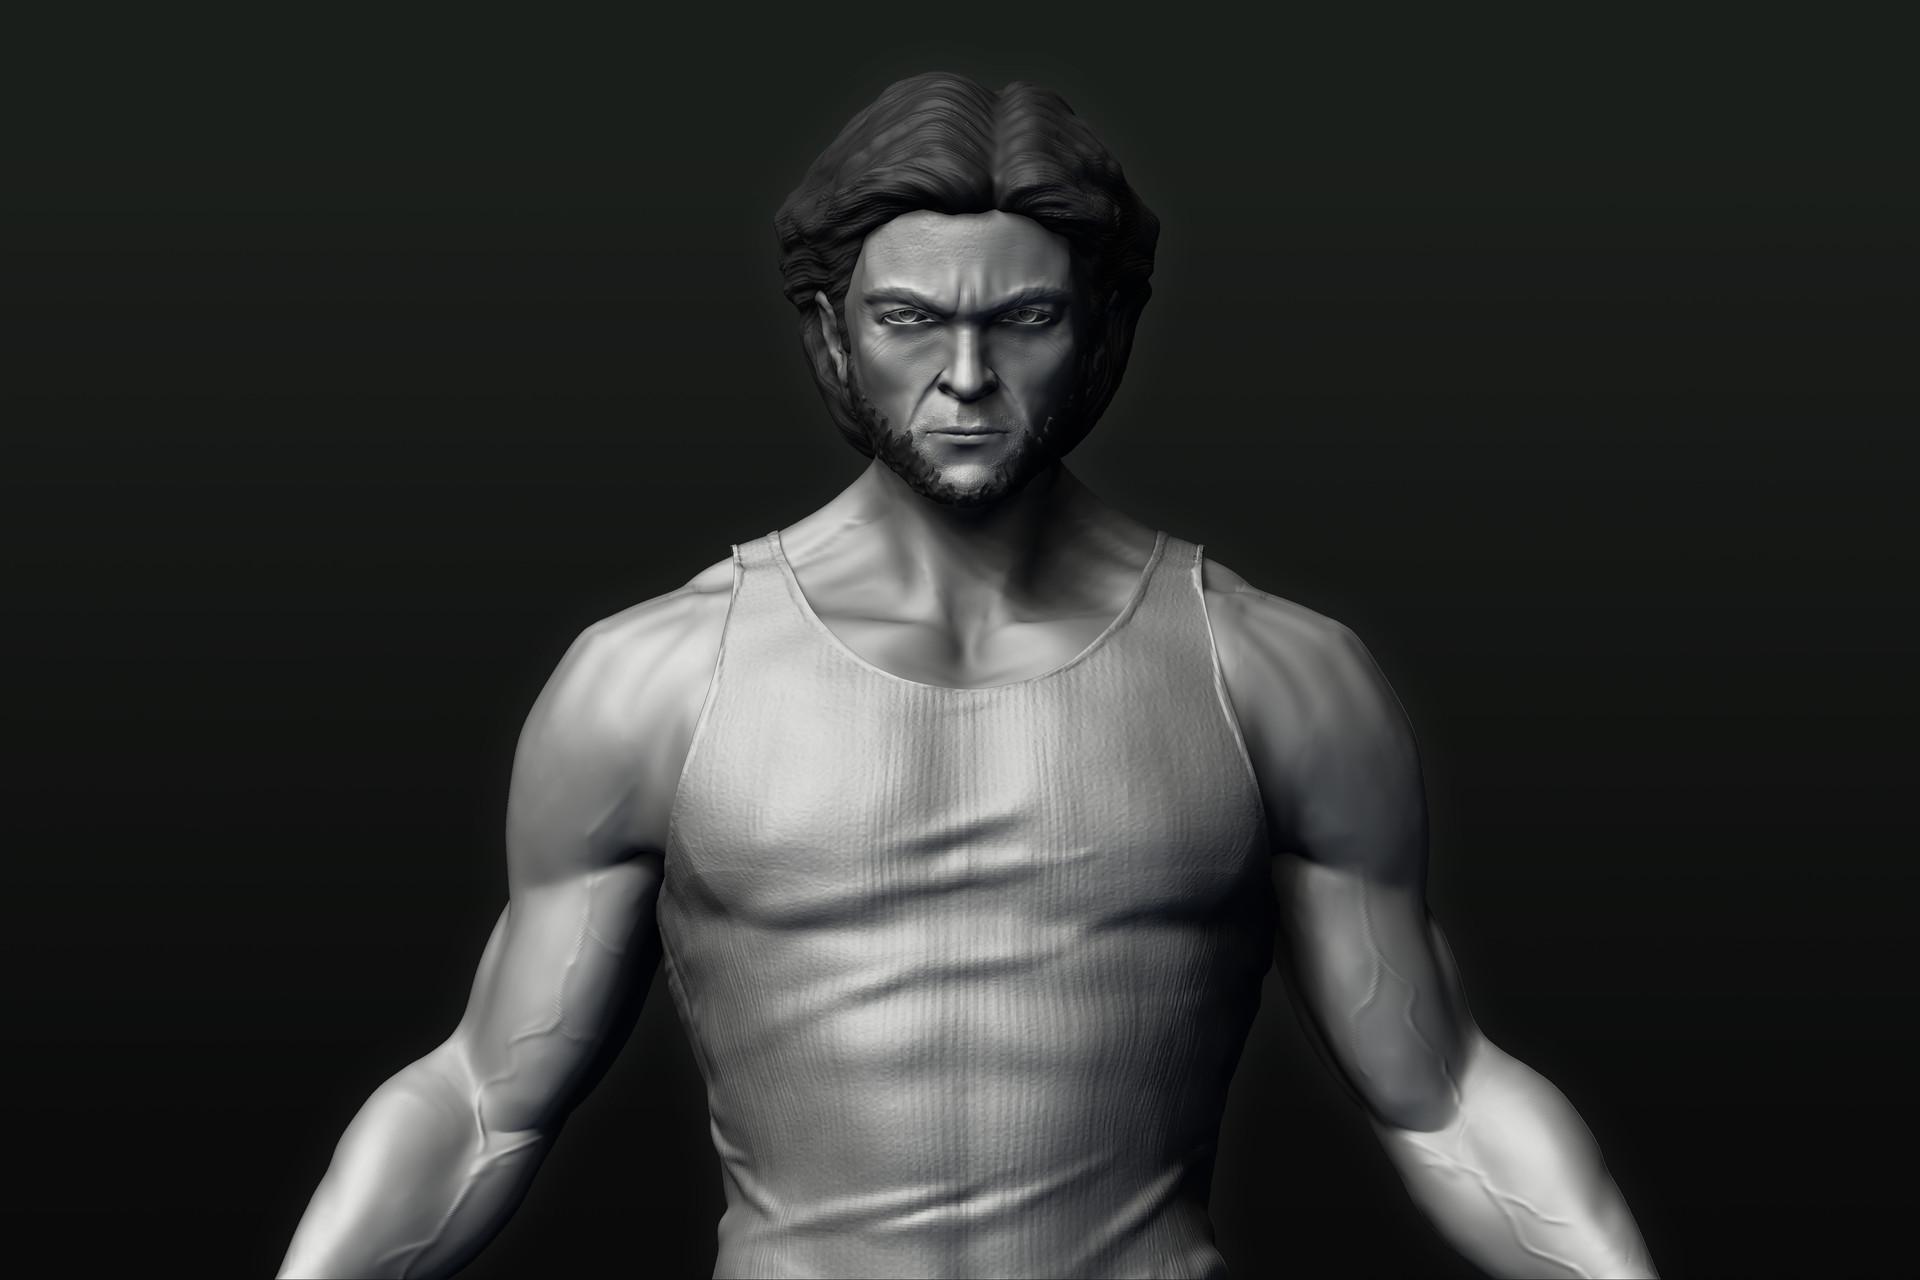 e306d06181 峻豪張- Wolverine - Hugh Jackman